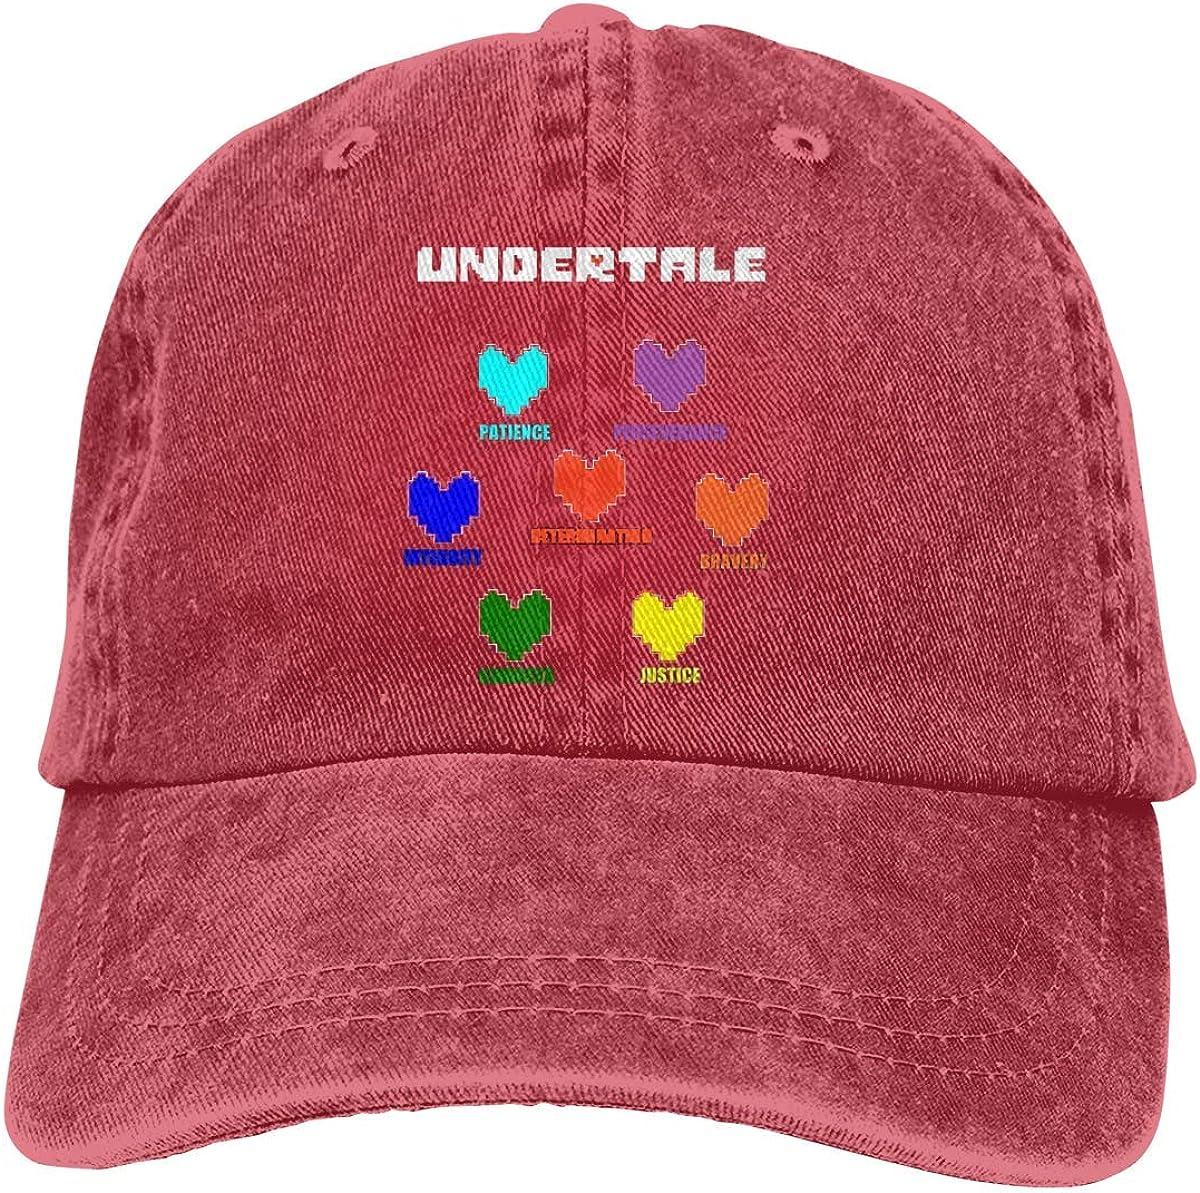 YINGSSMZ Undertale Heart Sports Denim Cap Adjustable Snapback Casquettes Unisex Plain Baseball Cowboy Hat Black